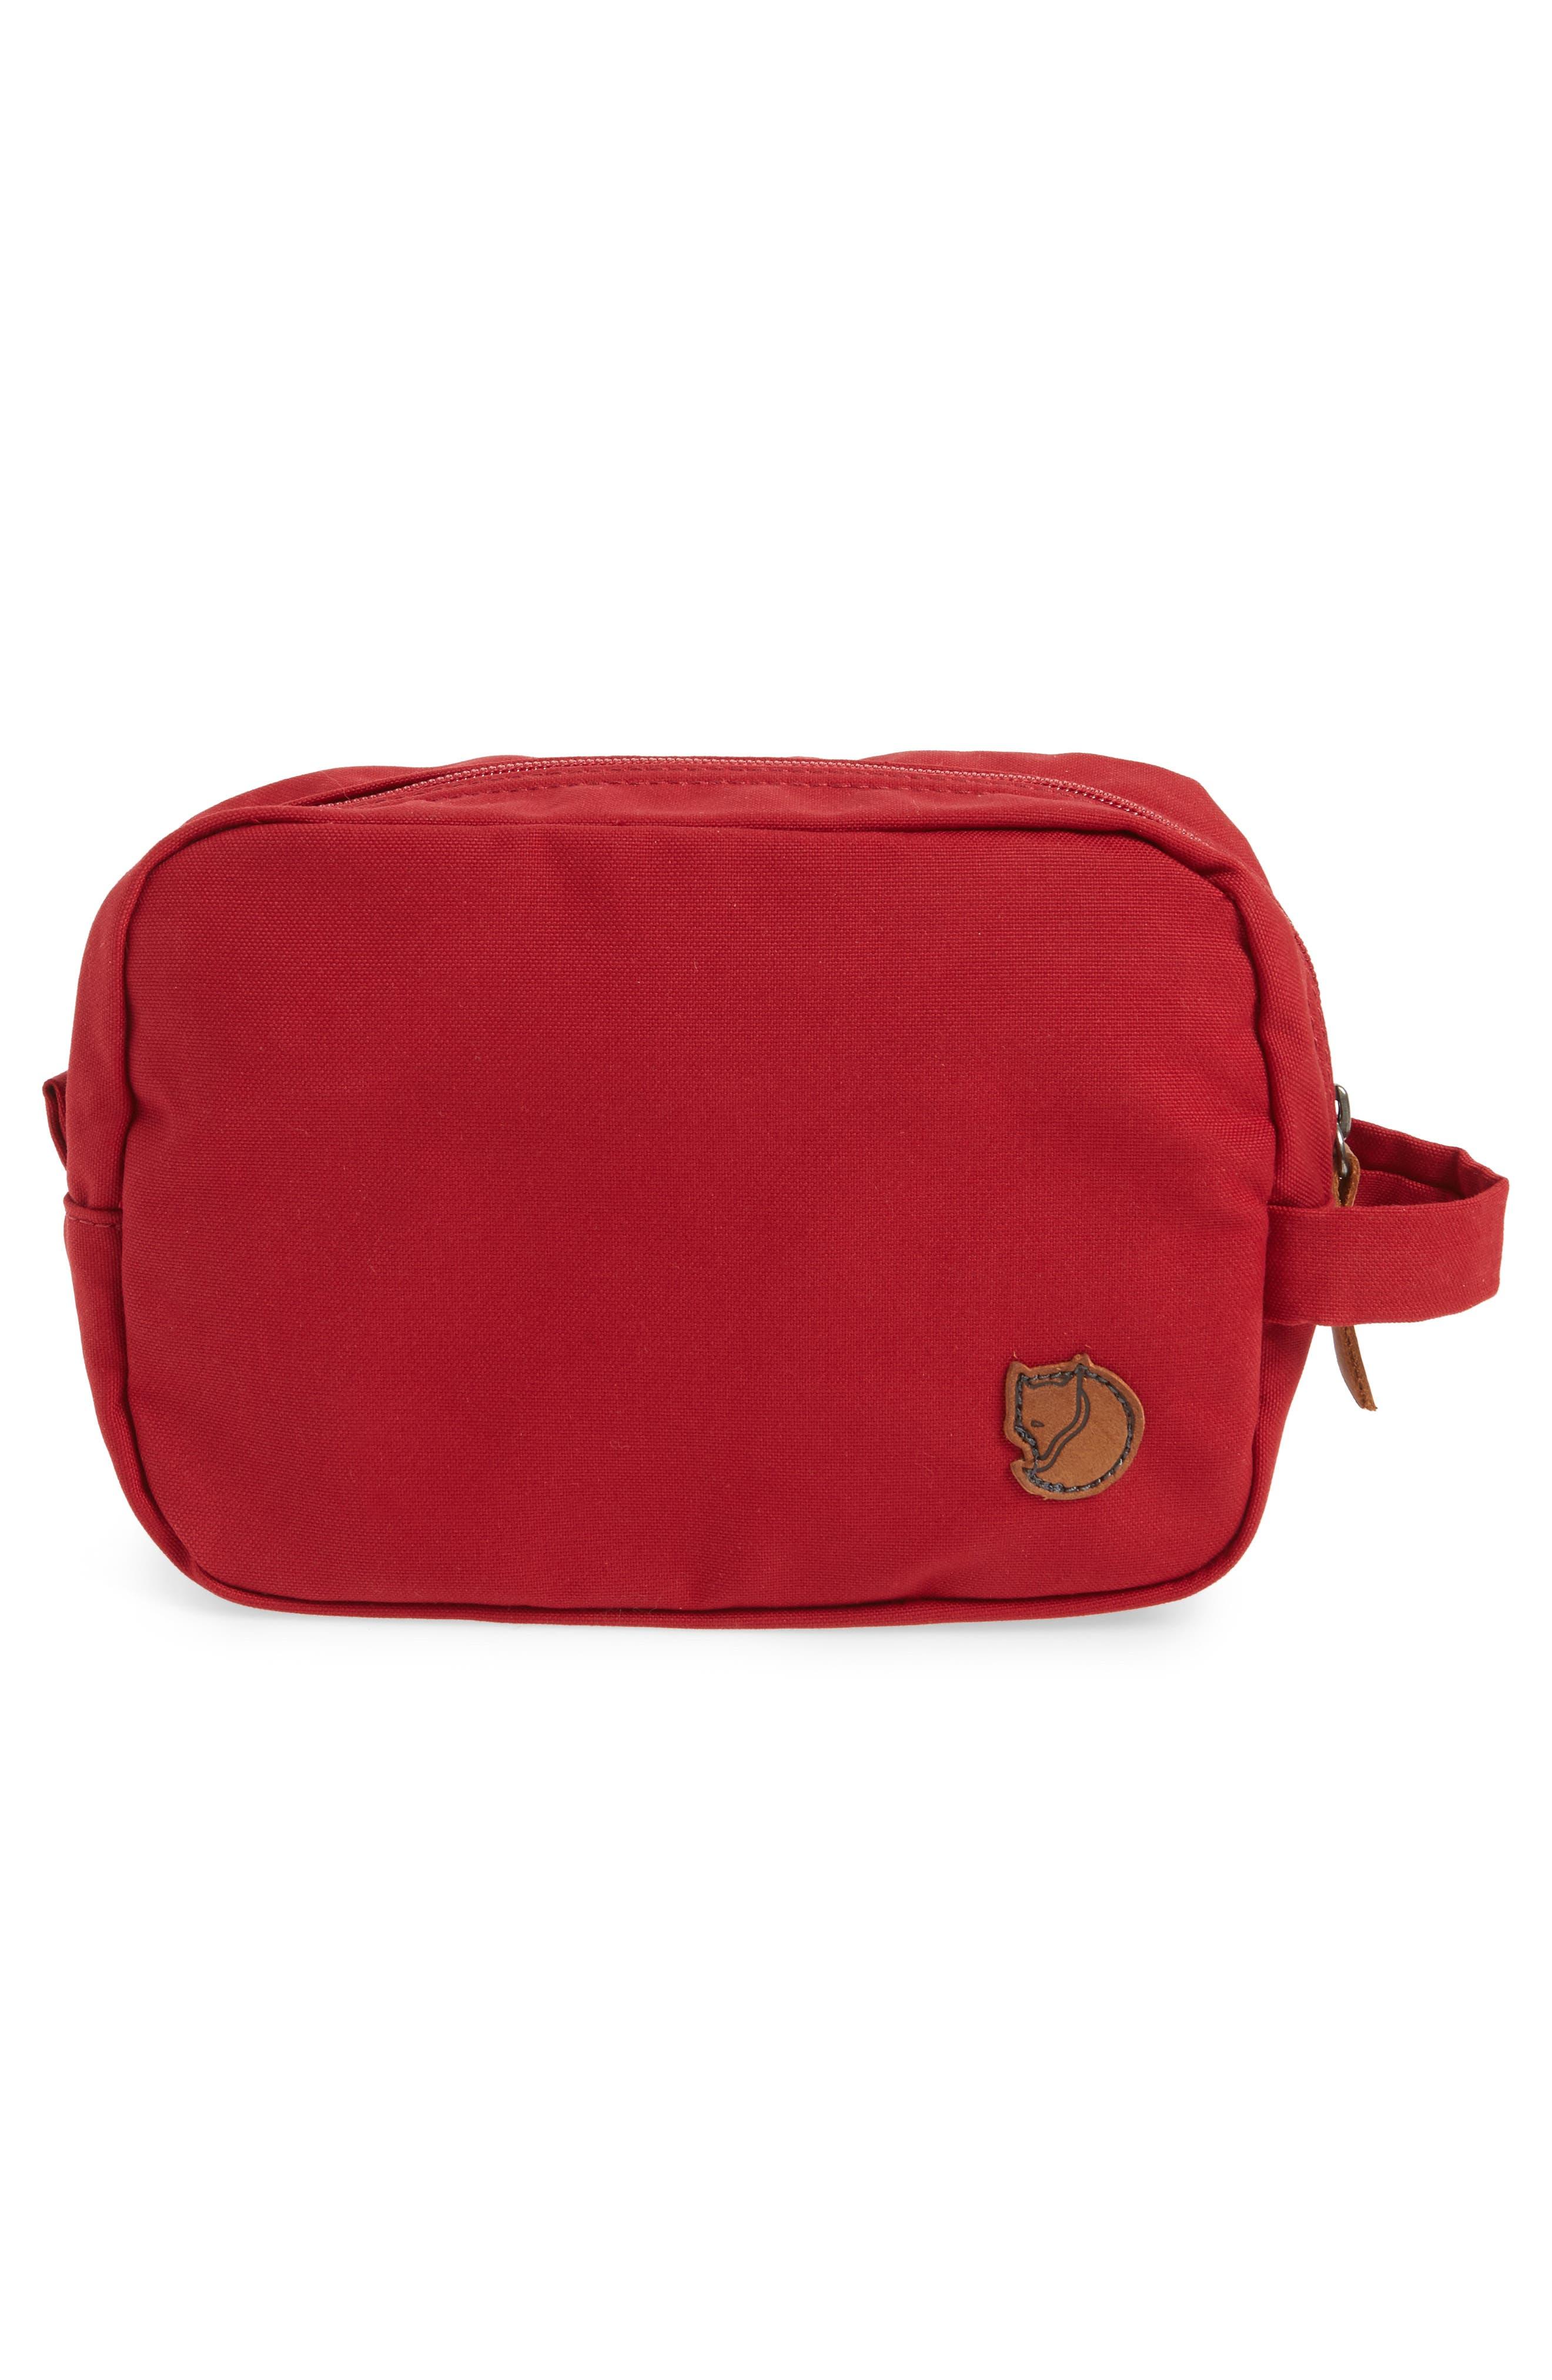 Fjällräven Water Resistant Gear Bag Pouch